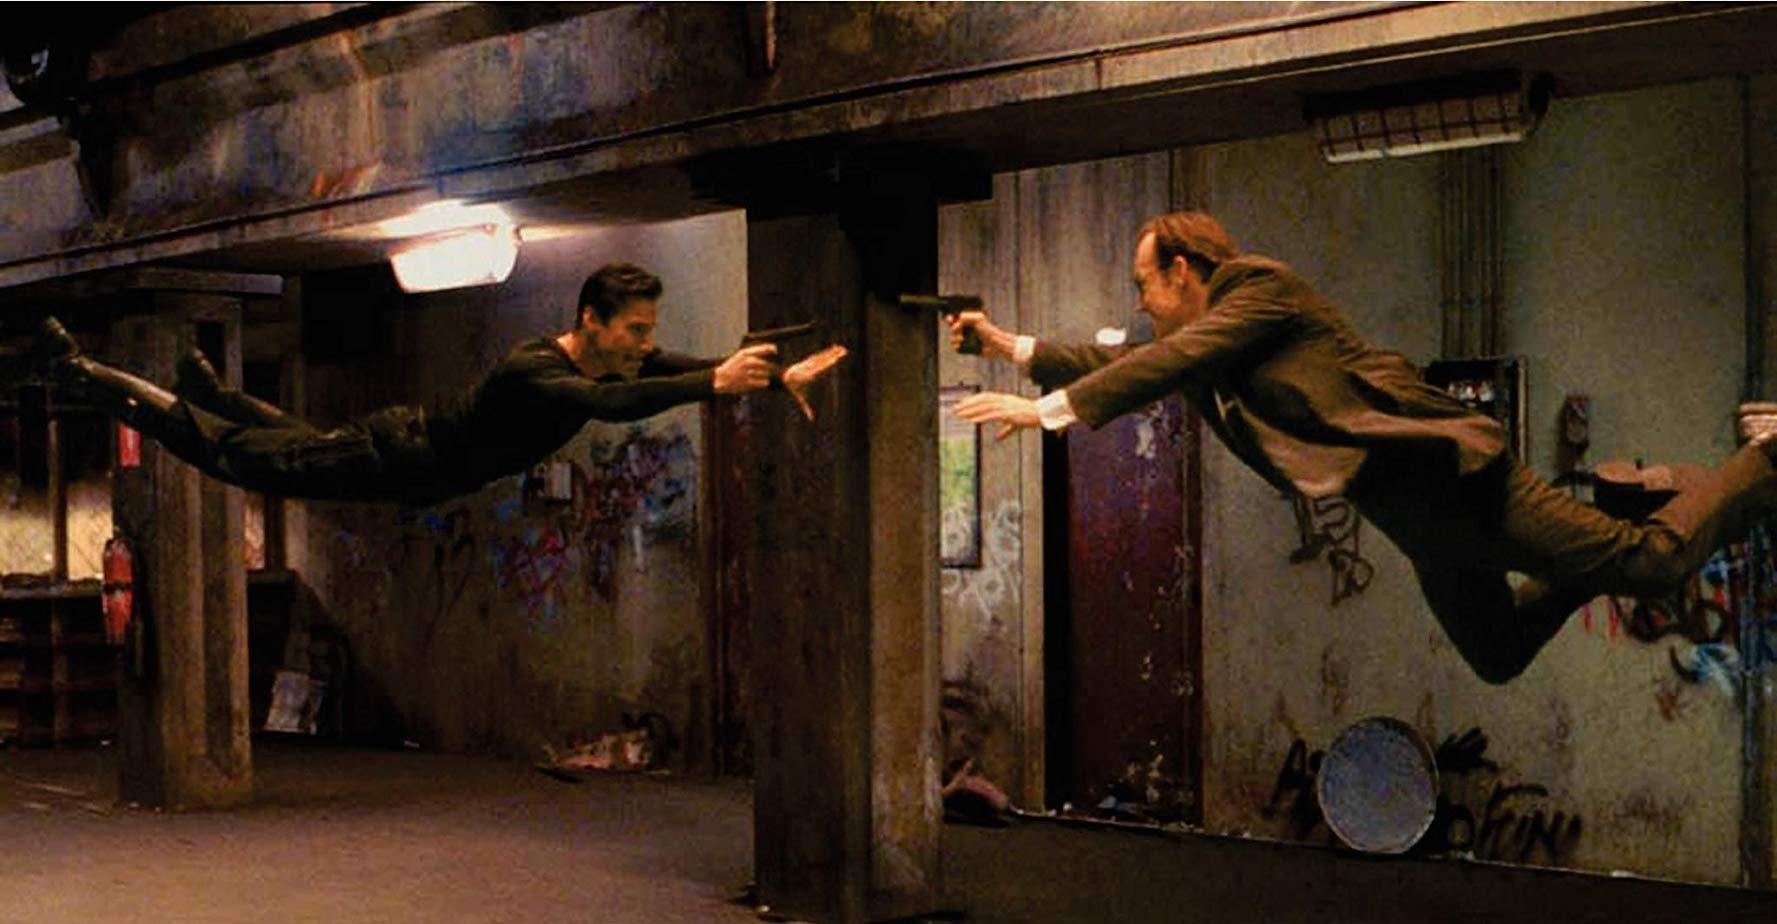 The Matrixbbb - 10 فیلم رزمی برتر تاریخ سینما – قسمت دوم